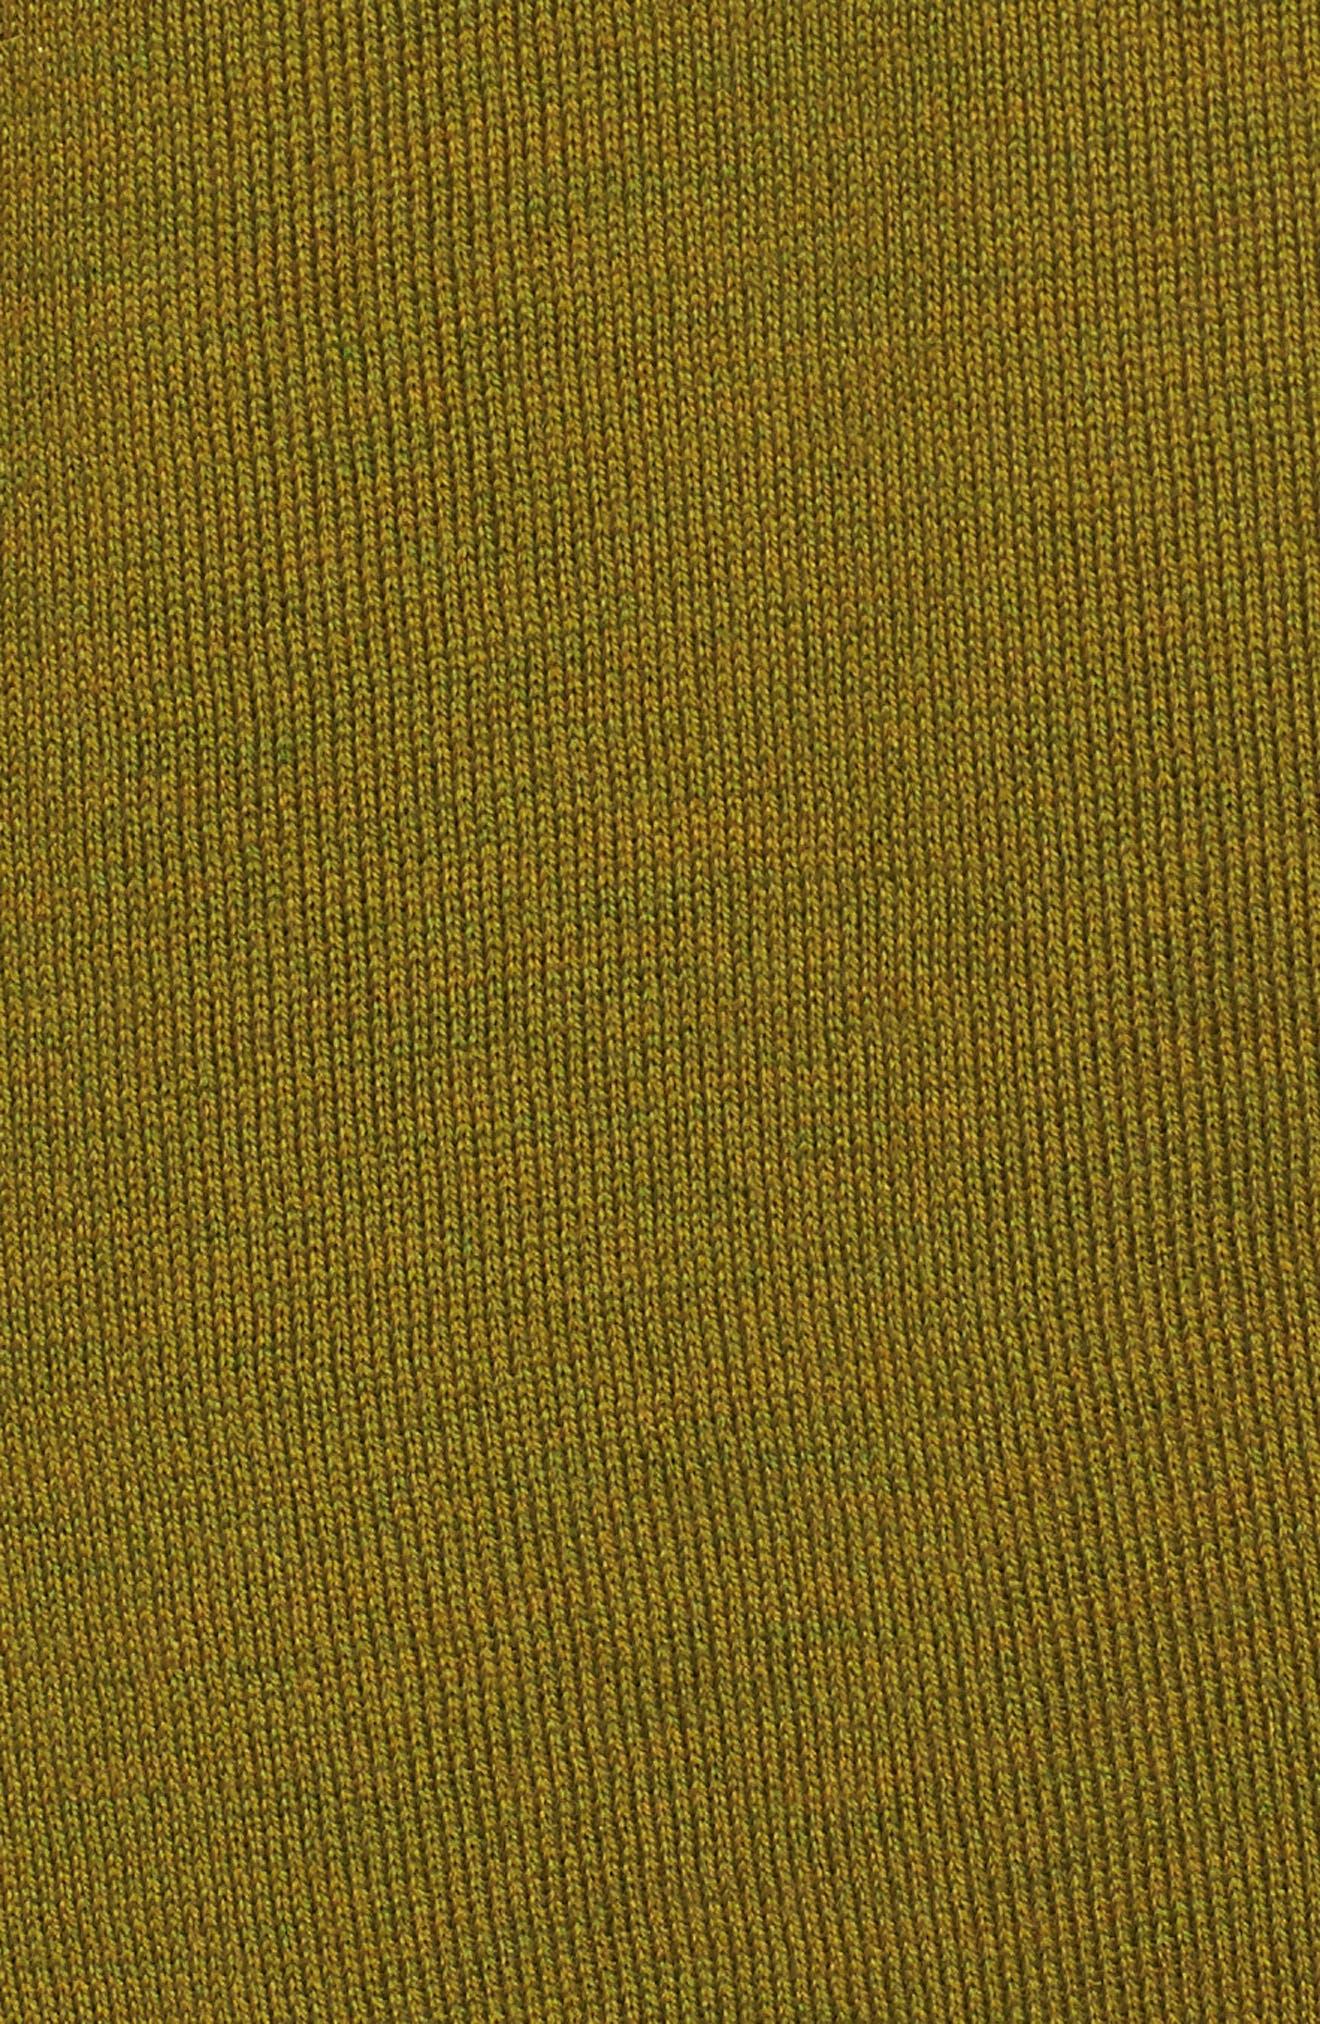 Merino Wool Boxy Turtleneck Sweater,                             Alternate thumbnail 26, color,